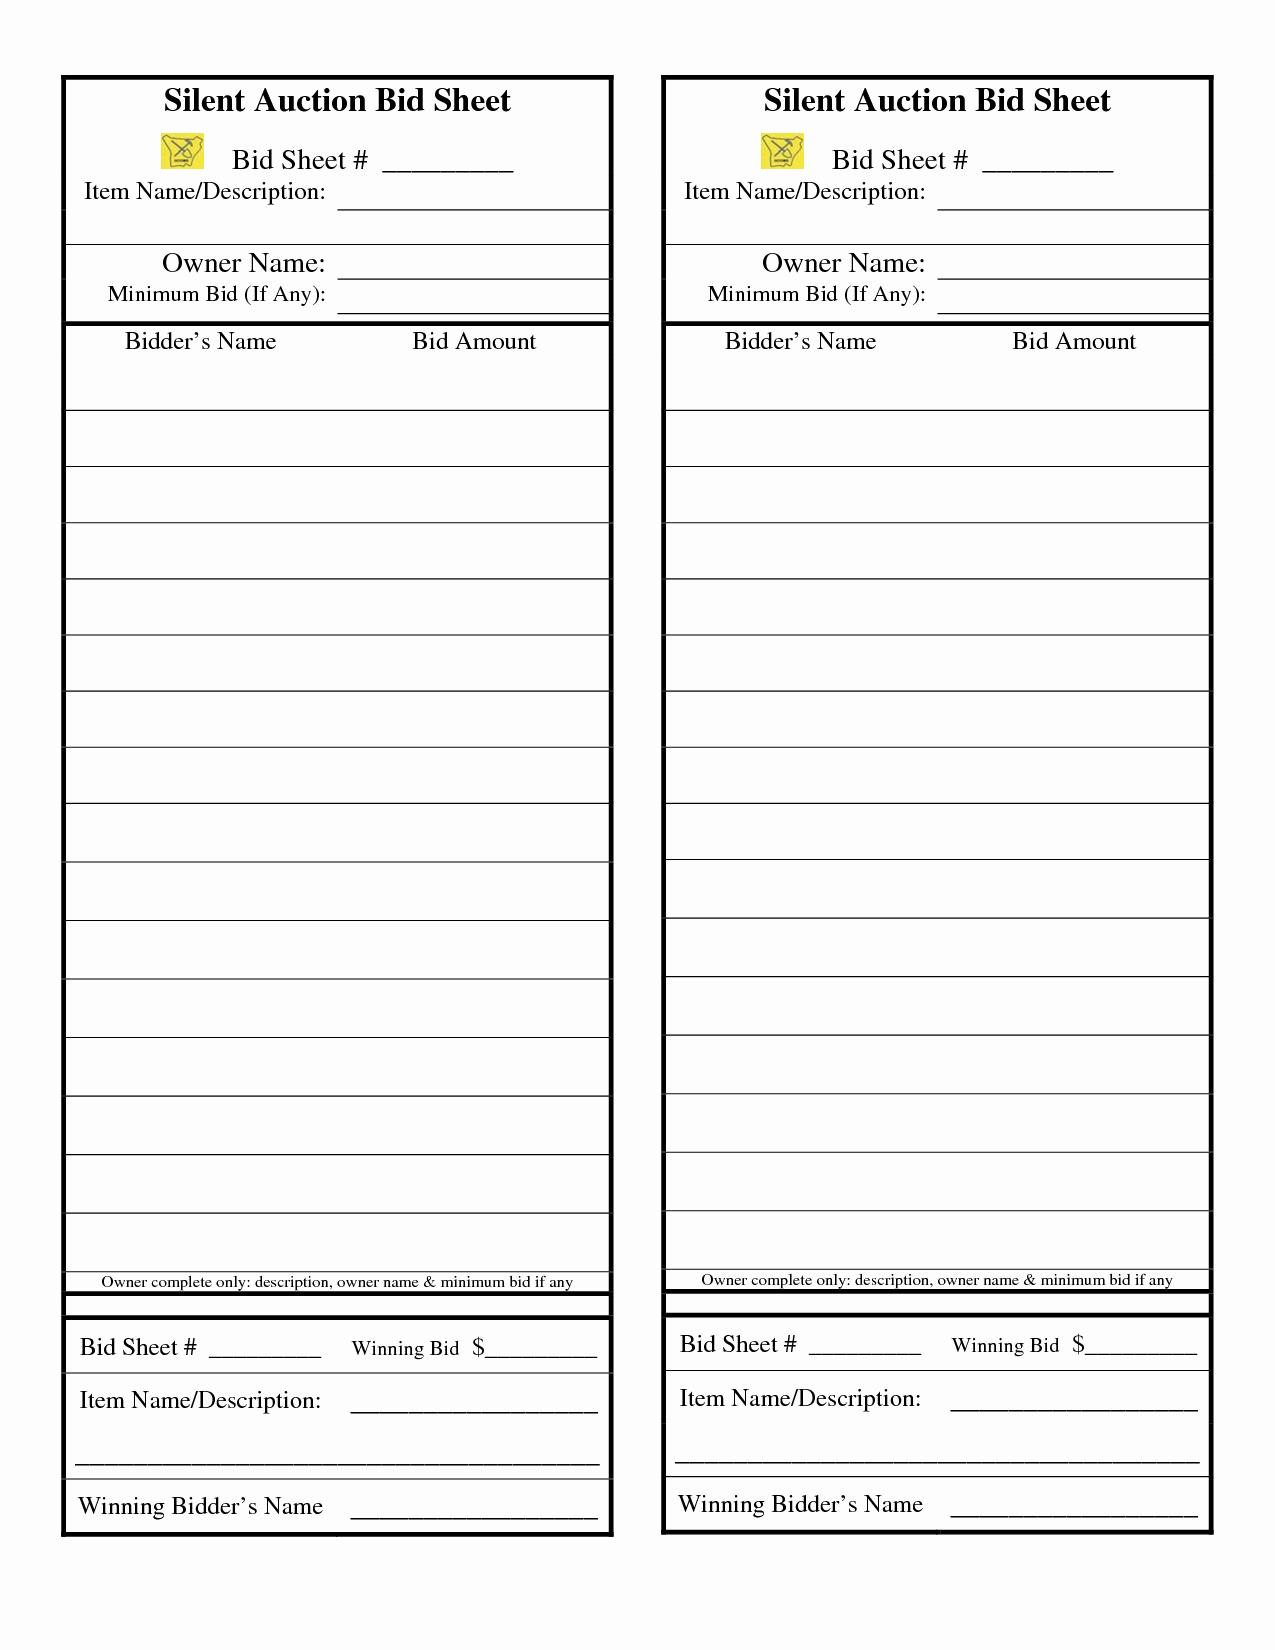 Silent Auction Bid Sheet Template Beautiful Template for Silent Auction Bid Sheet